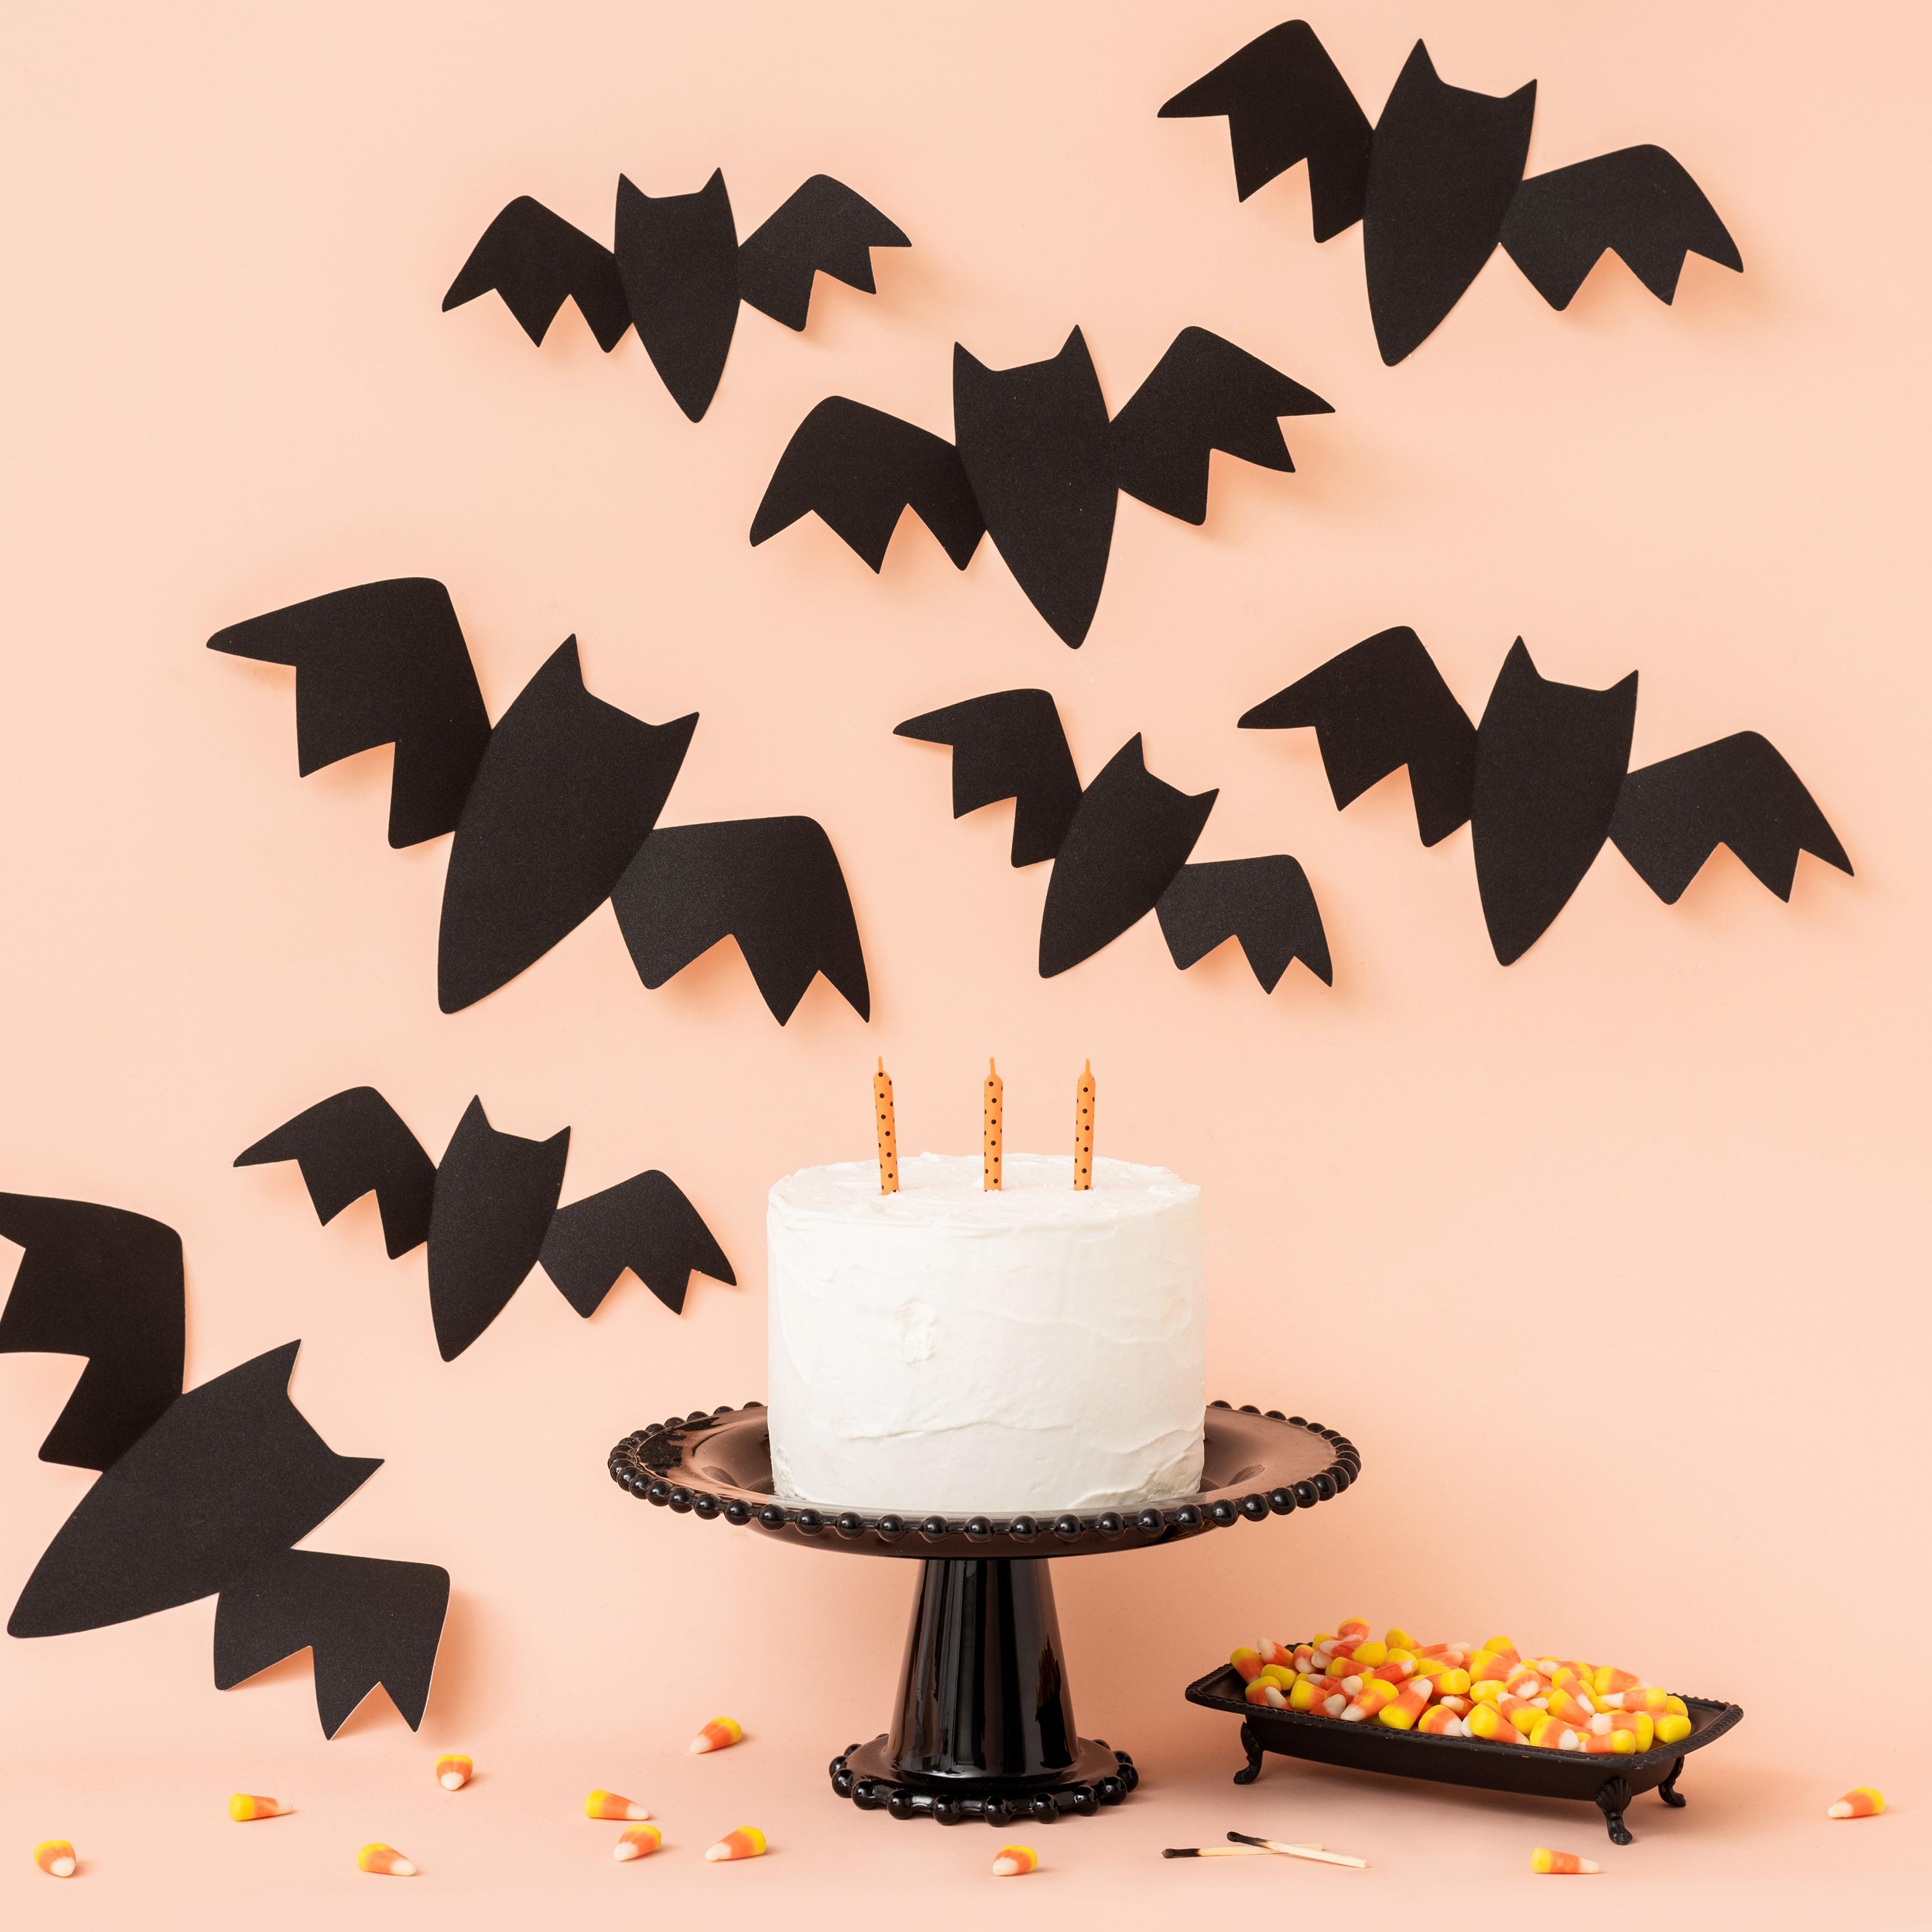 Spoooky Adhesive Cardstock Wall Bats 9/Pkg-Black Glitter